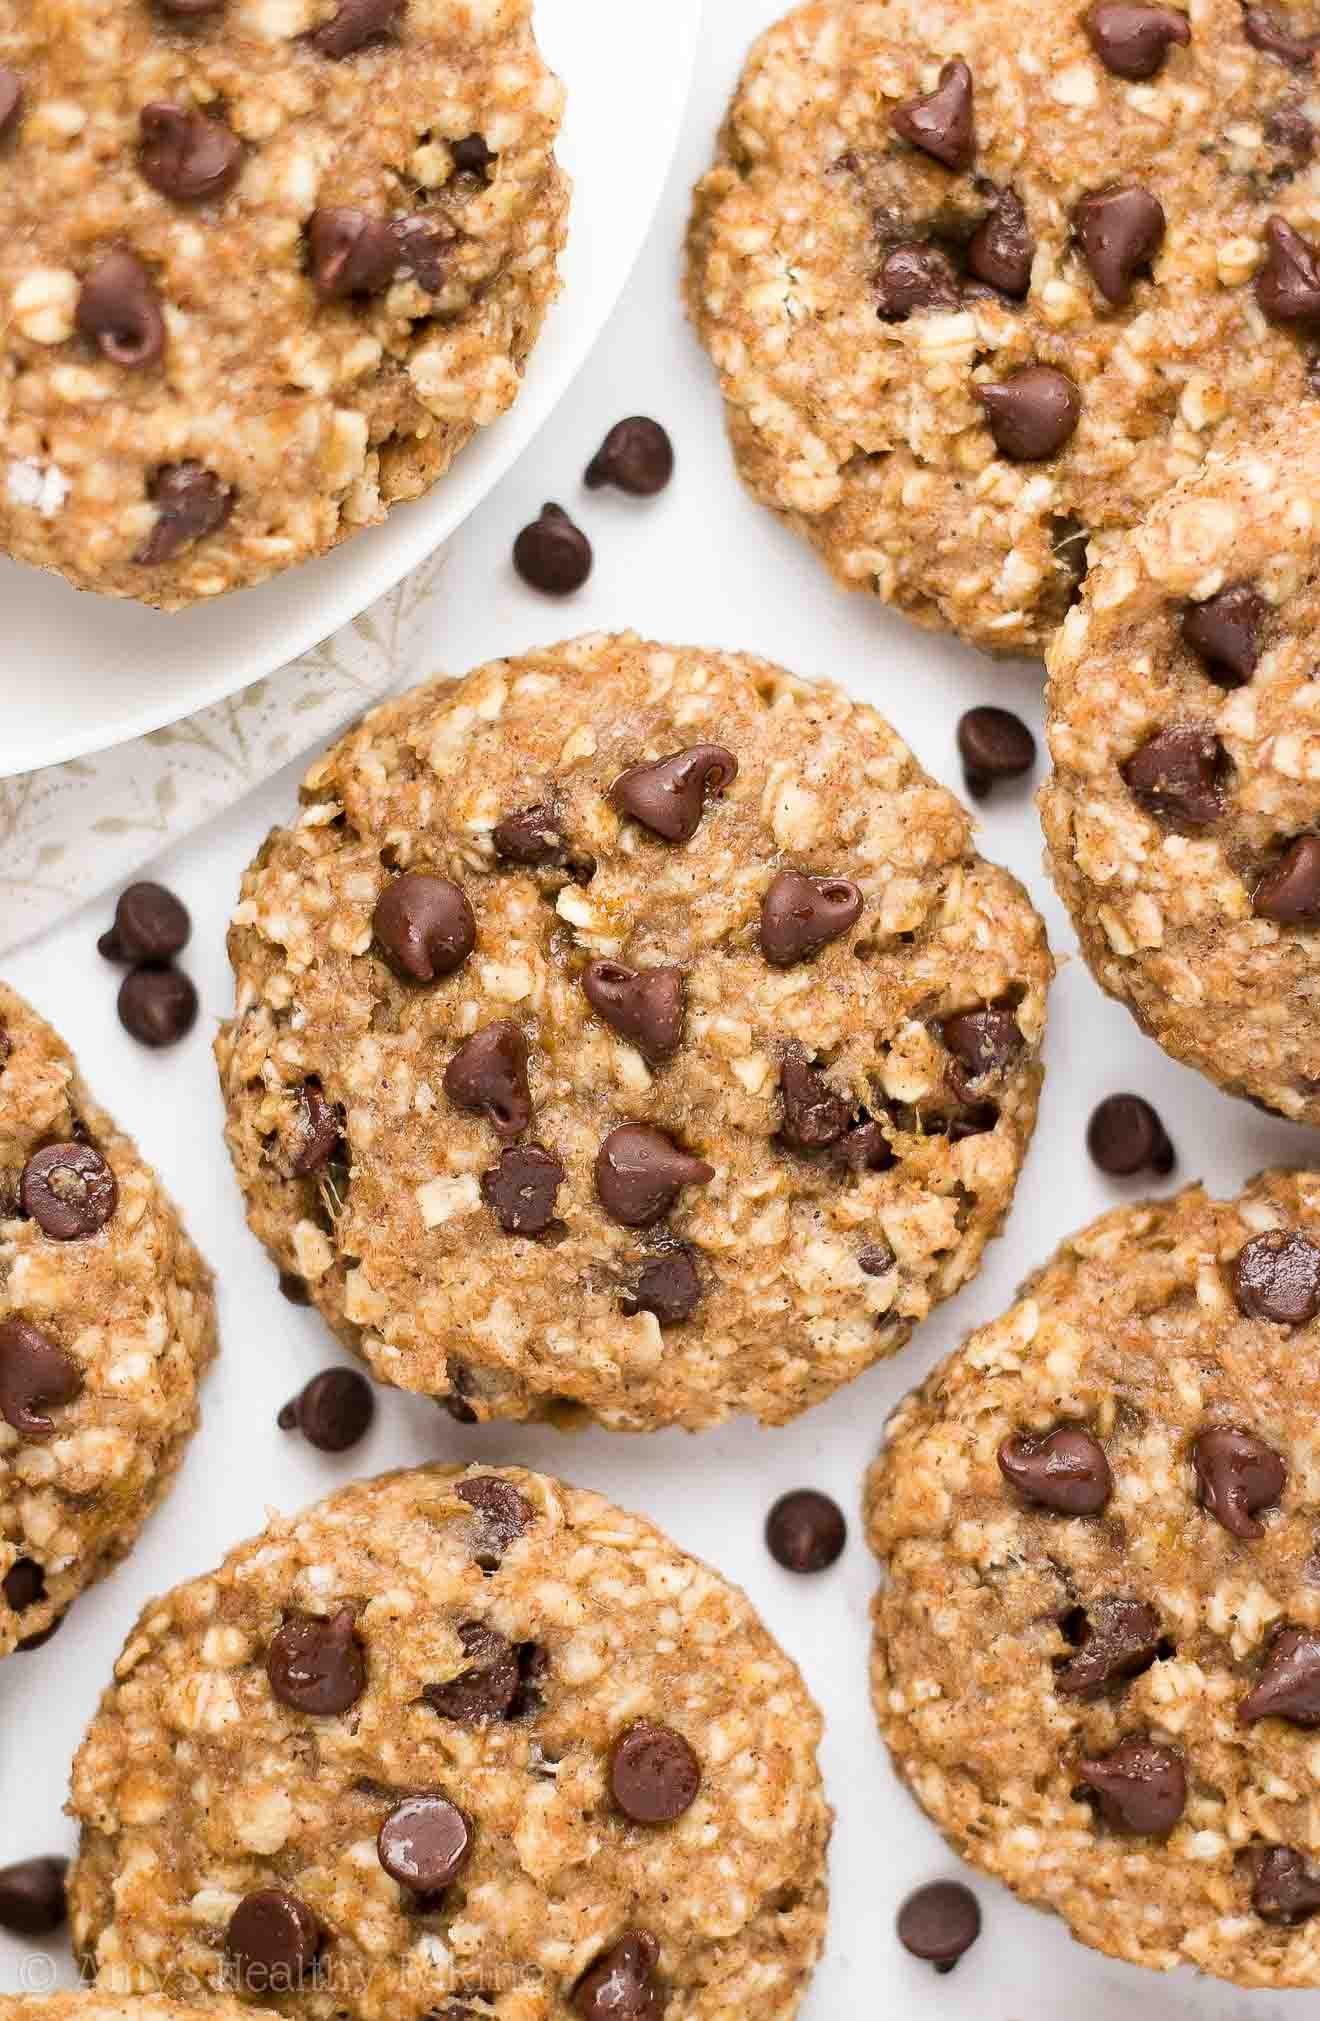 Healthy Homemade Oatmeal Cookies  Healthy Chocolate Chip Banana Oatmeal Breakfast Cookies